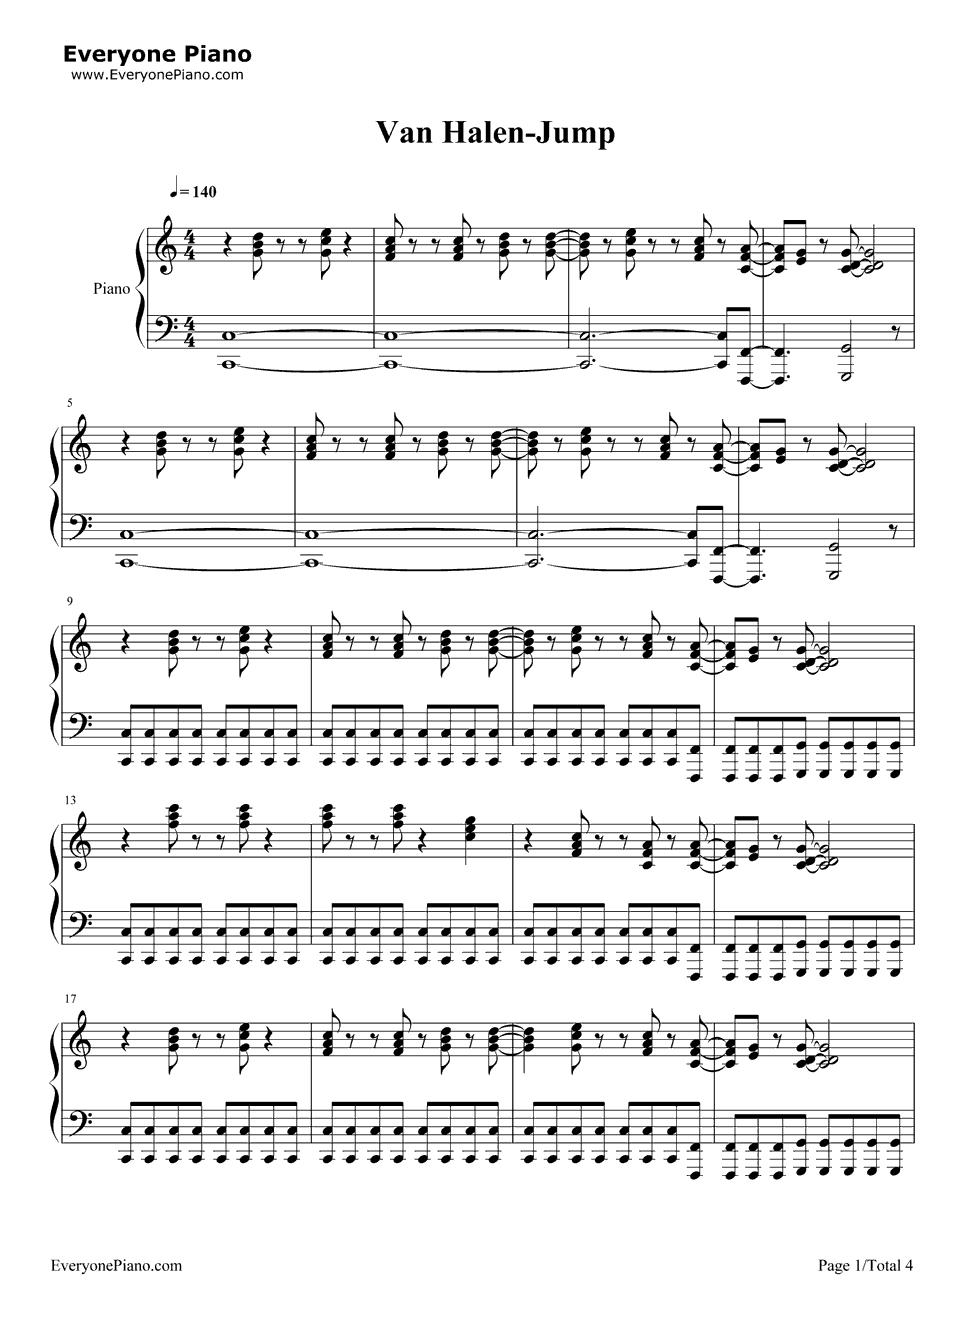 Jump van halen stave preview 1 free piano sheet music piano chords listen now print sheet jump van halen stave preview 1 hexwebz Choice Image